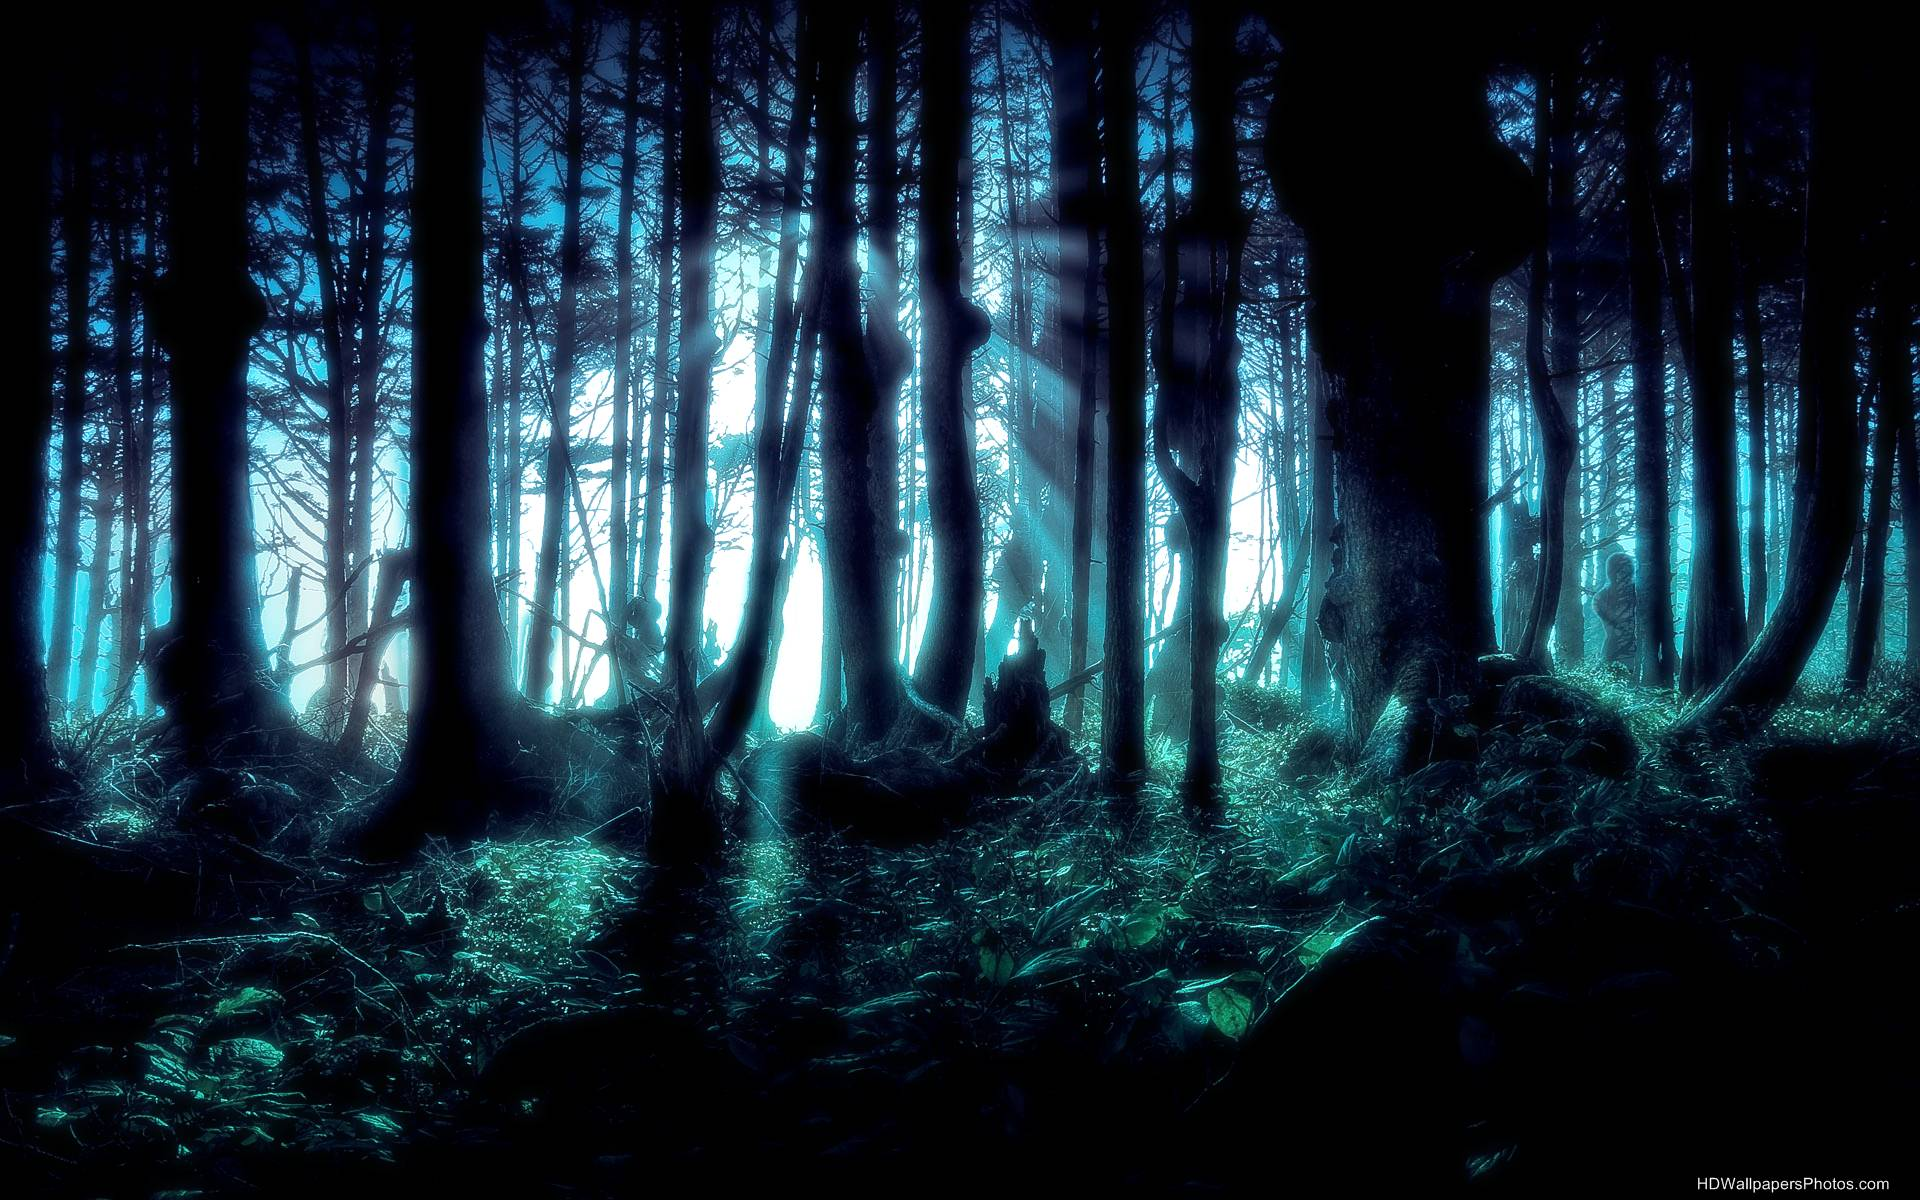 HD Dark Forest Wallpaper - WallpaperSafari